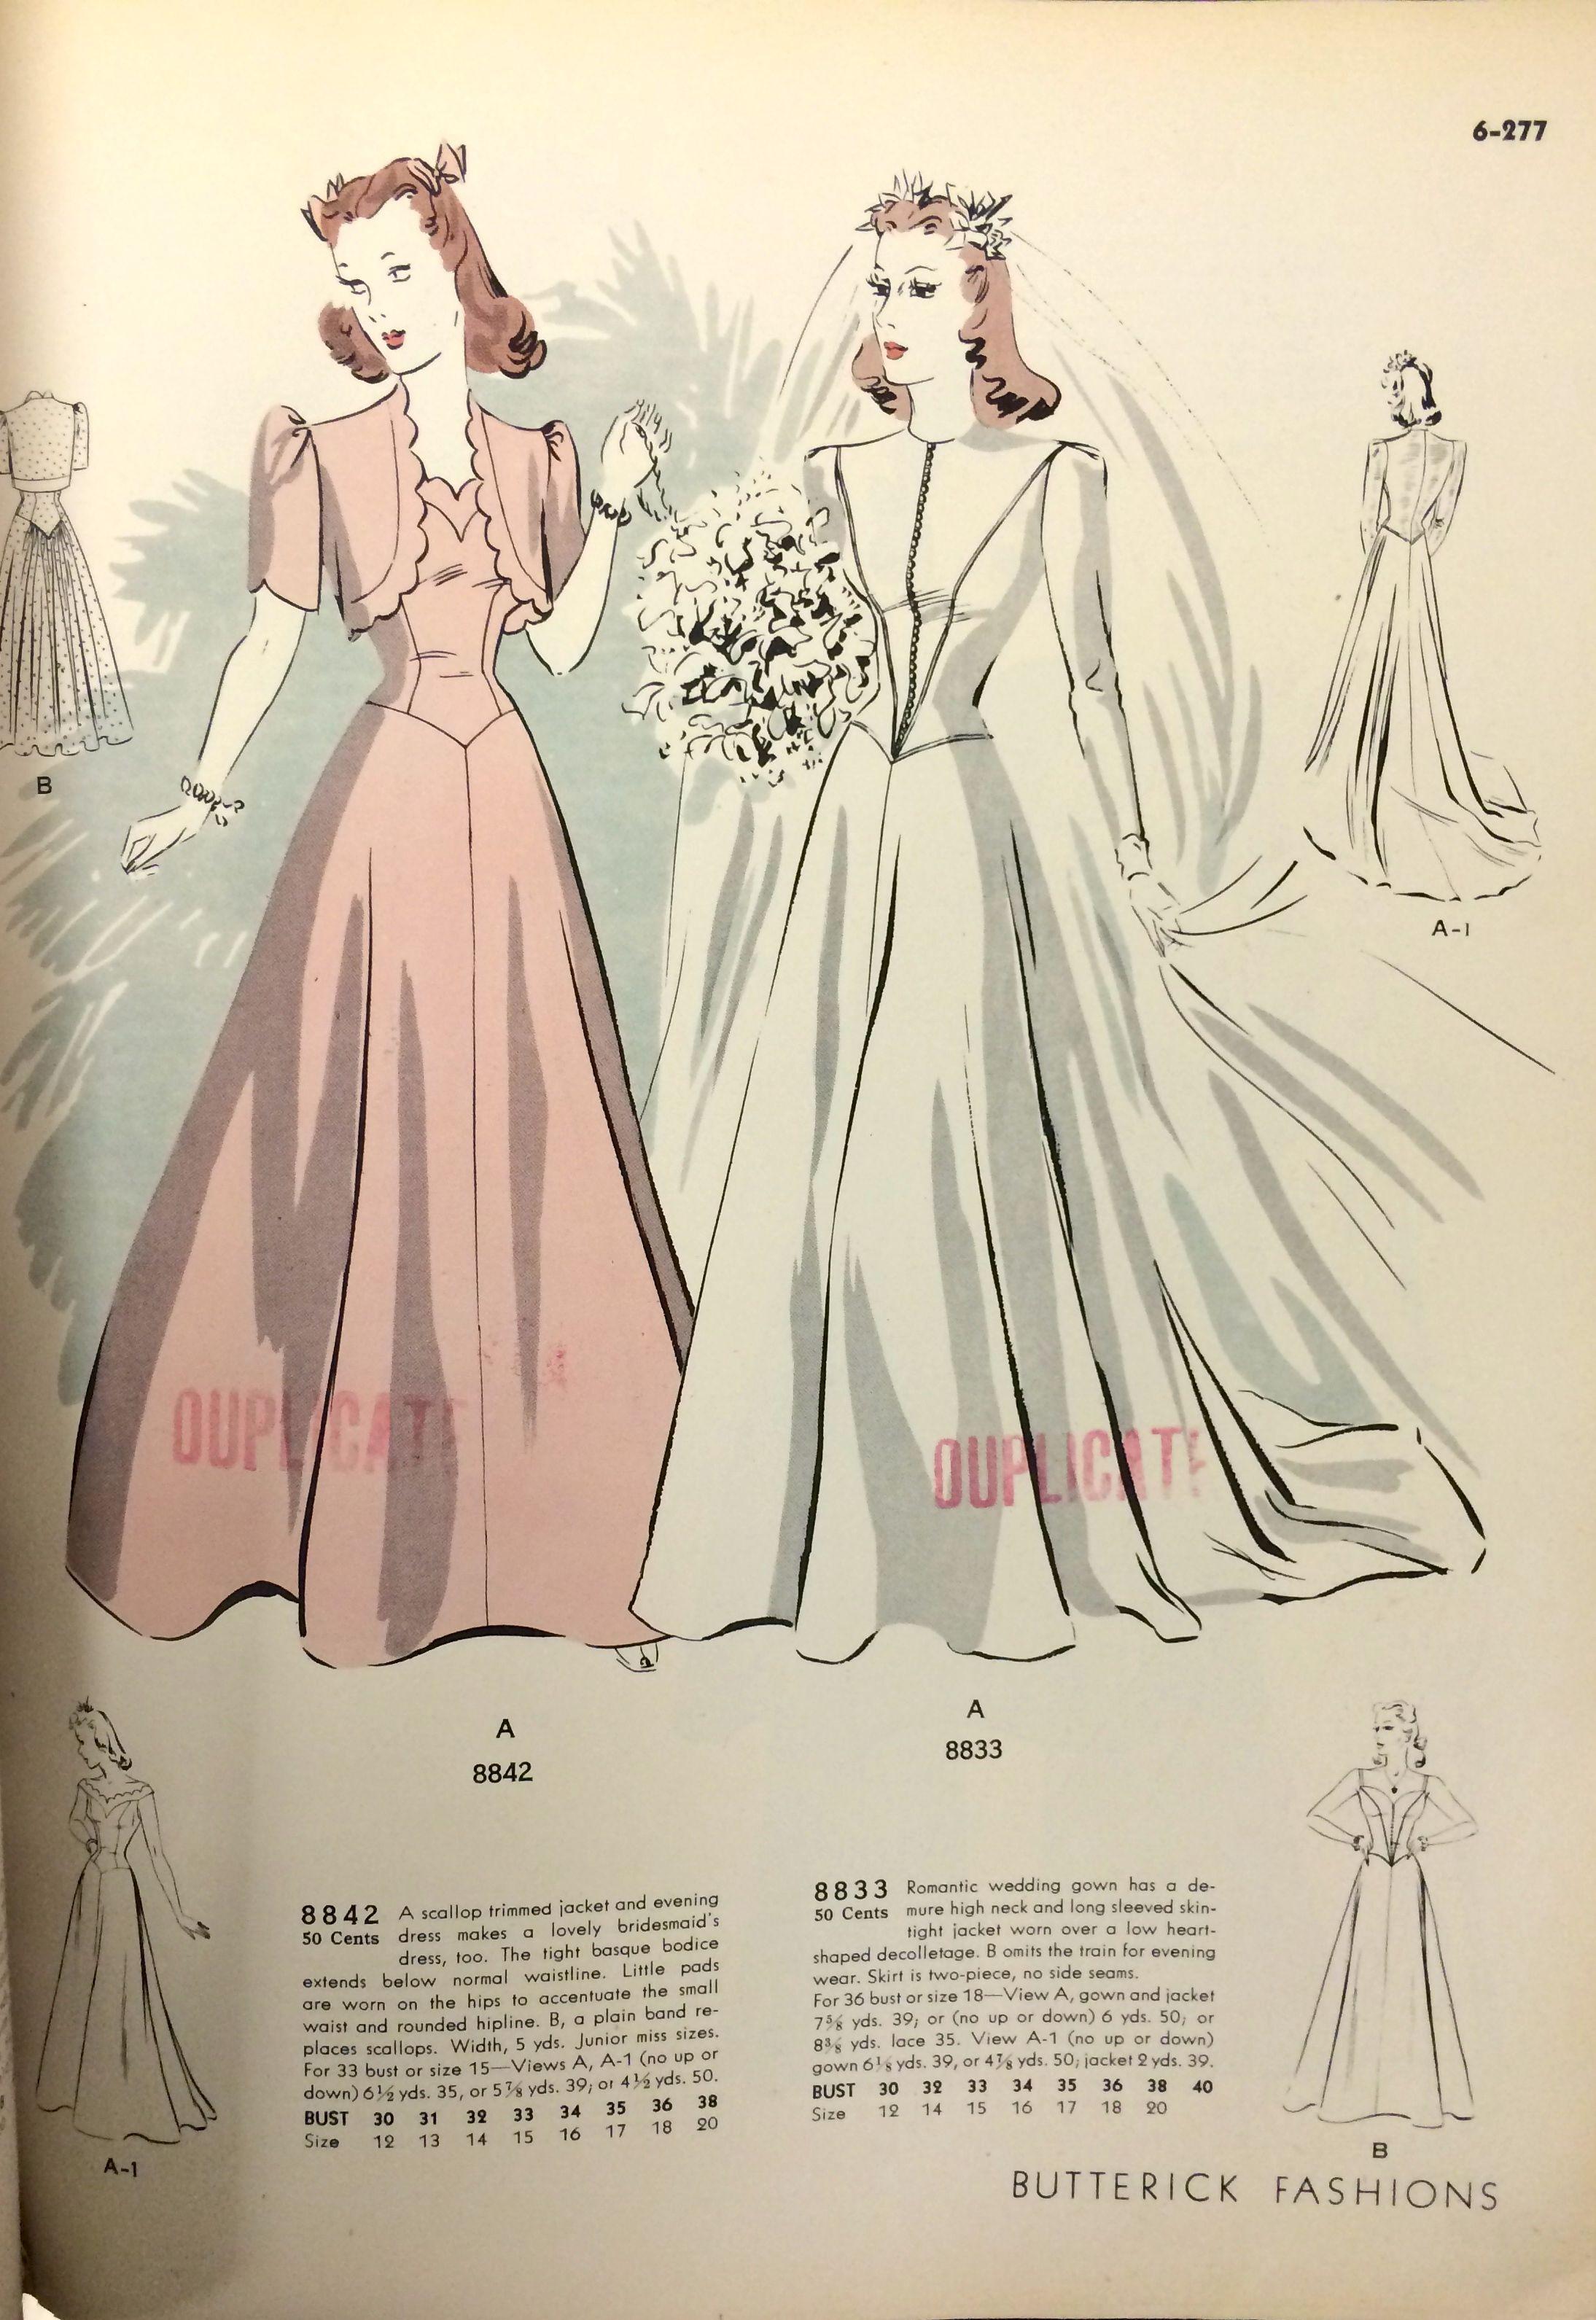 1964 Vintage VOGUE Sewing Pattern B36 WEDDING DRESS GOWN BY JOHN CAVANAGH 1777